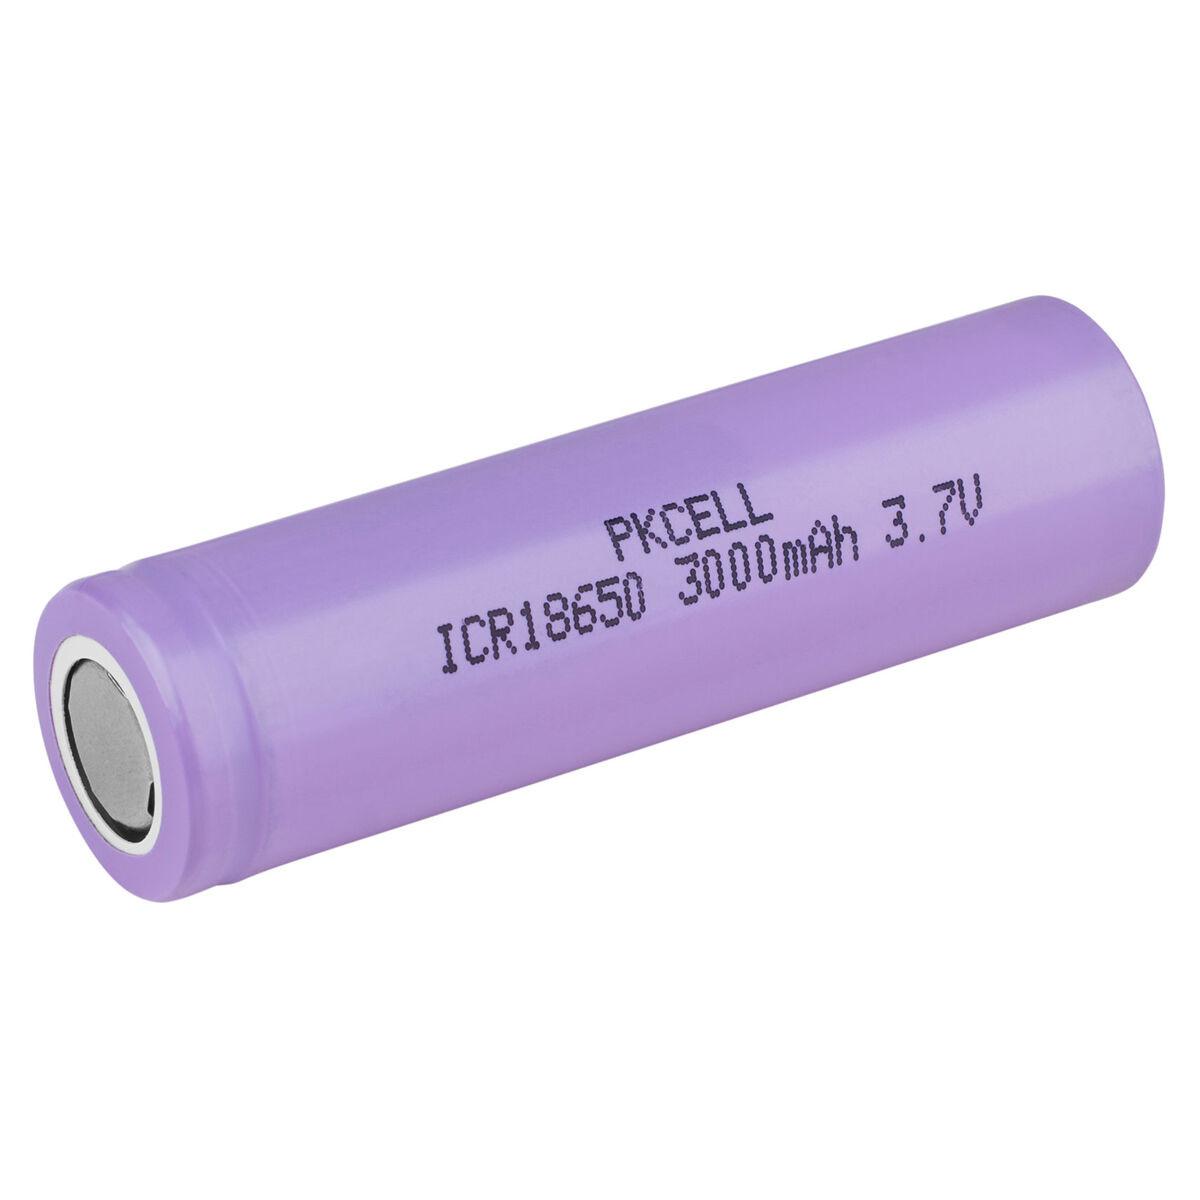 PKCELL Flat Top 18650 3.7V 3000mAh Rechargeable Li-Ion Battery